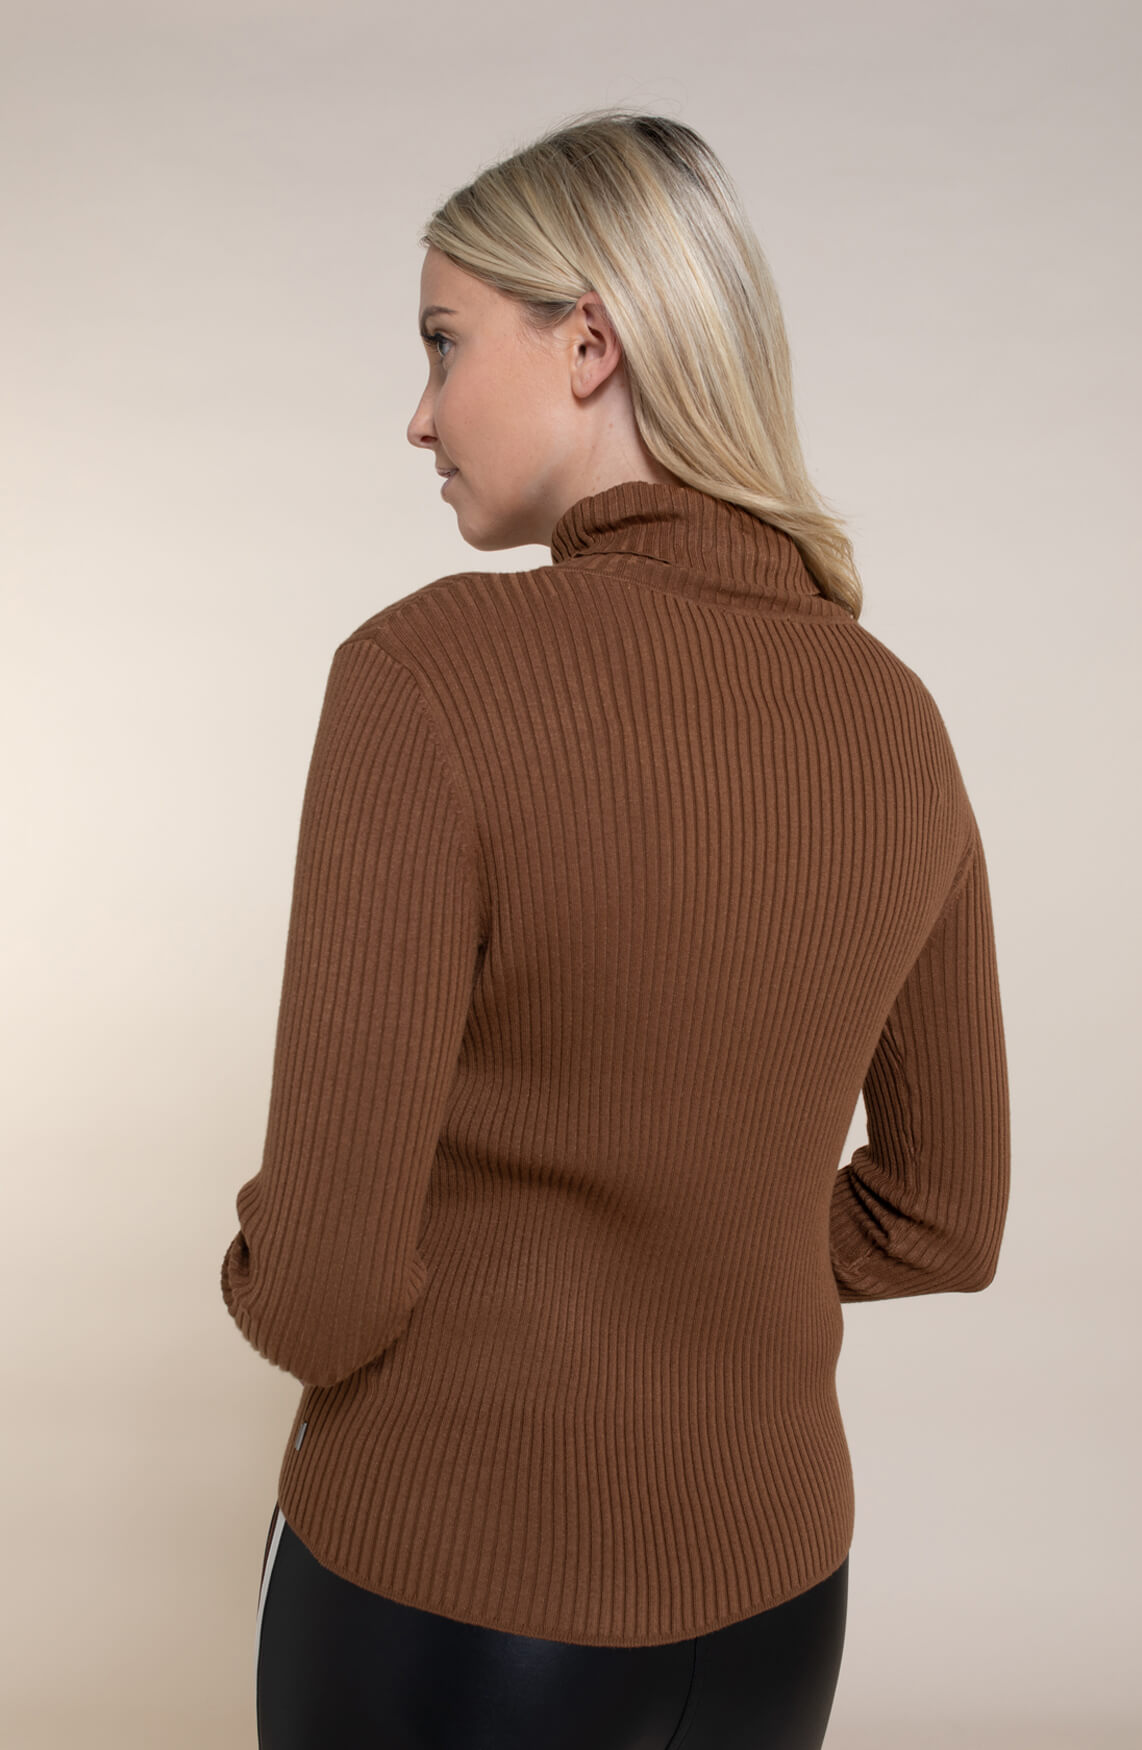 Anna Dames Ribgebreide pullover Bruin